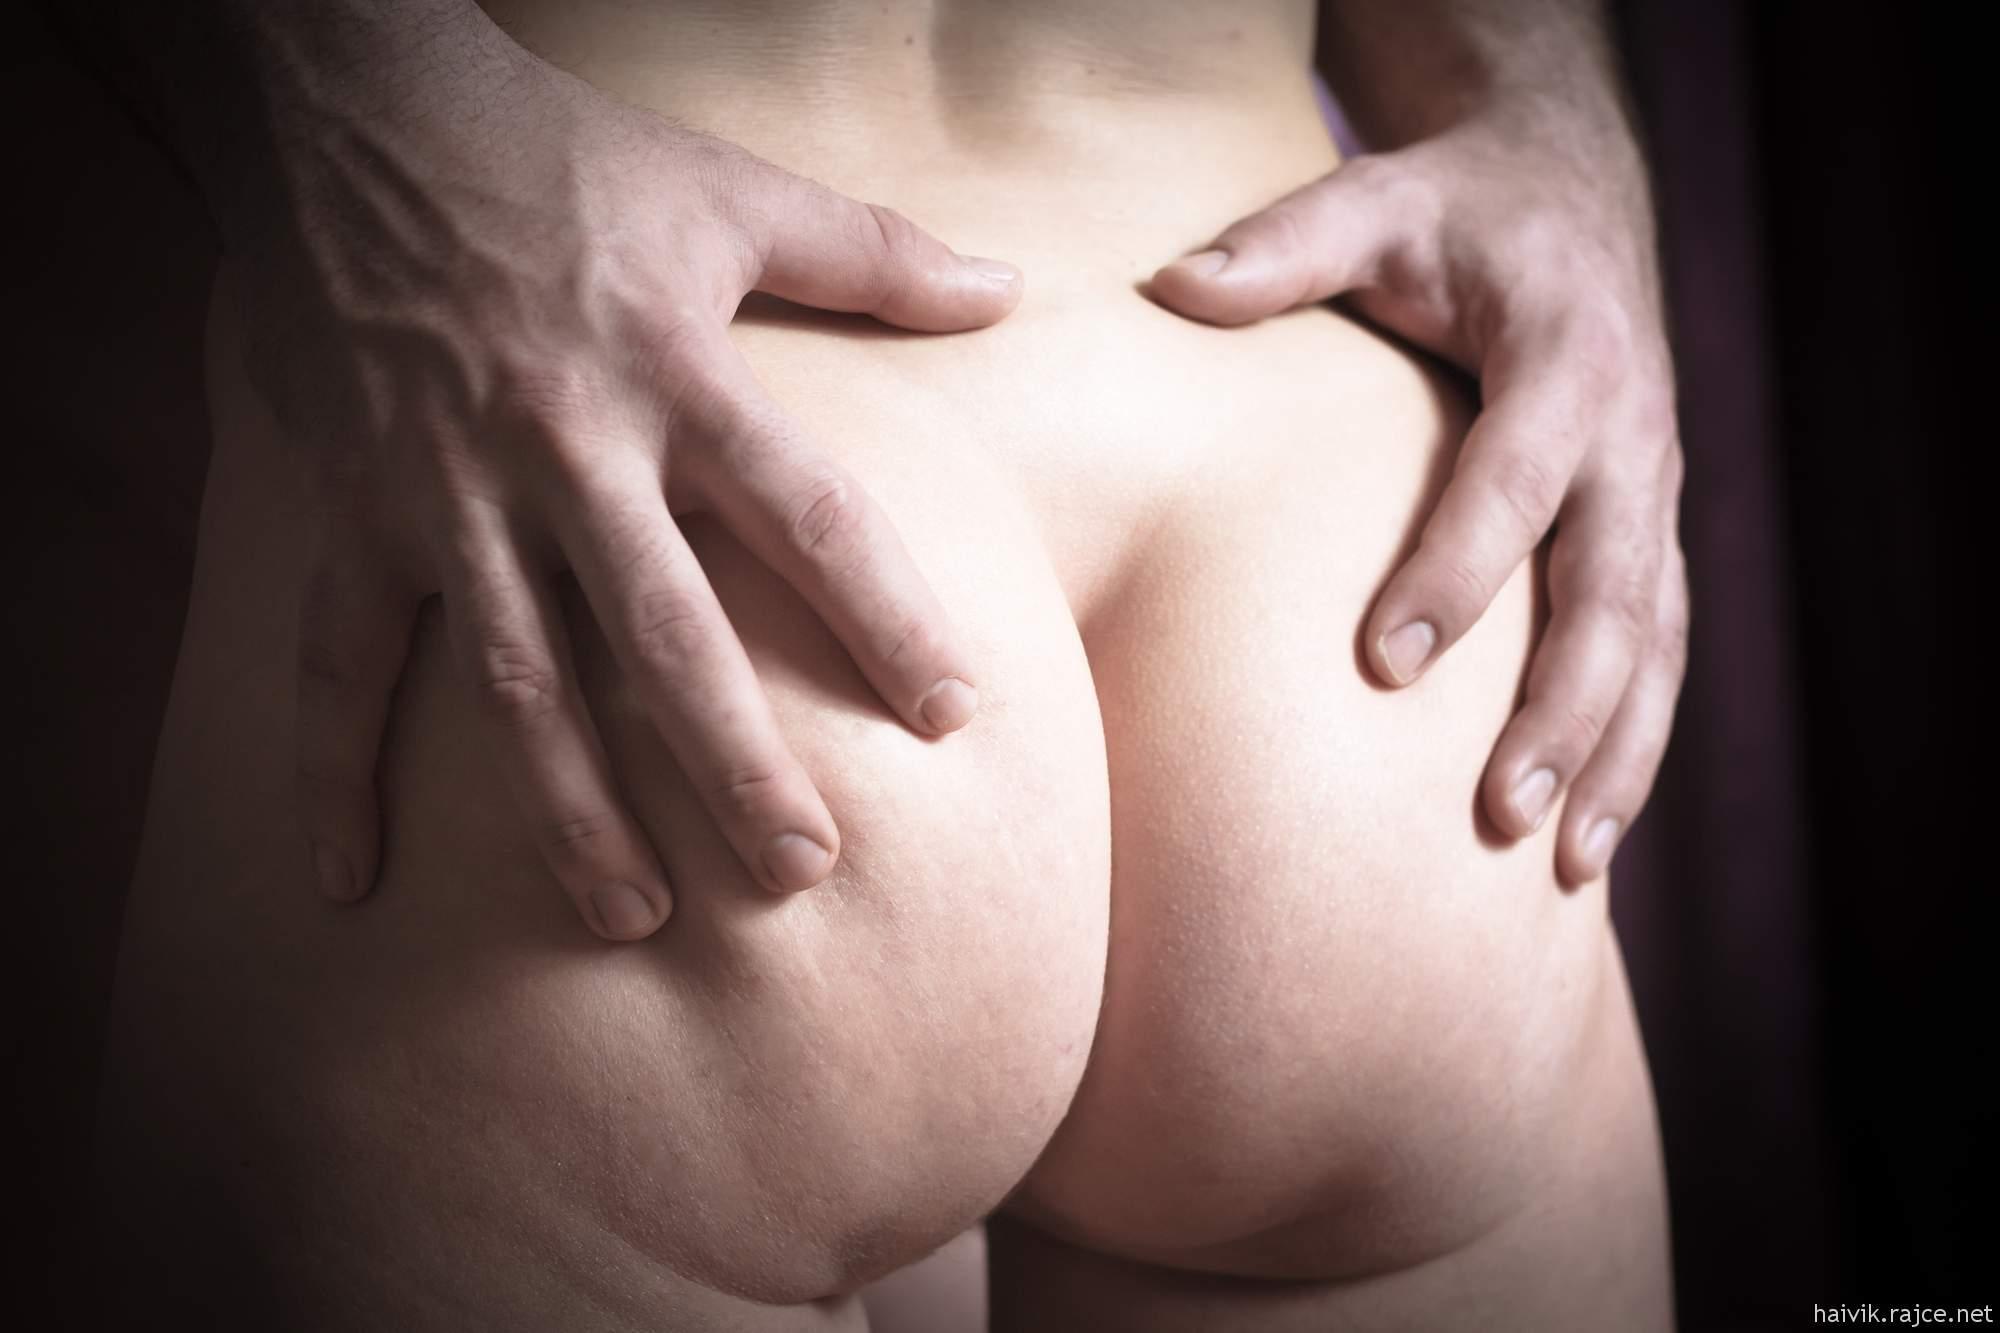 purenudism picture   rajce.idnes srpen nakd